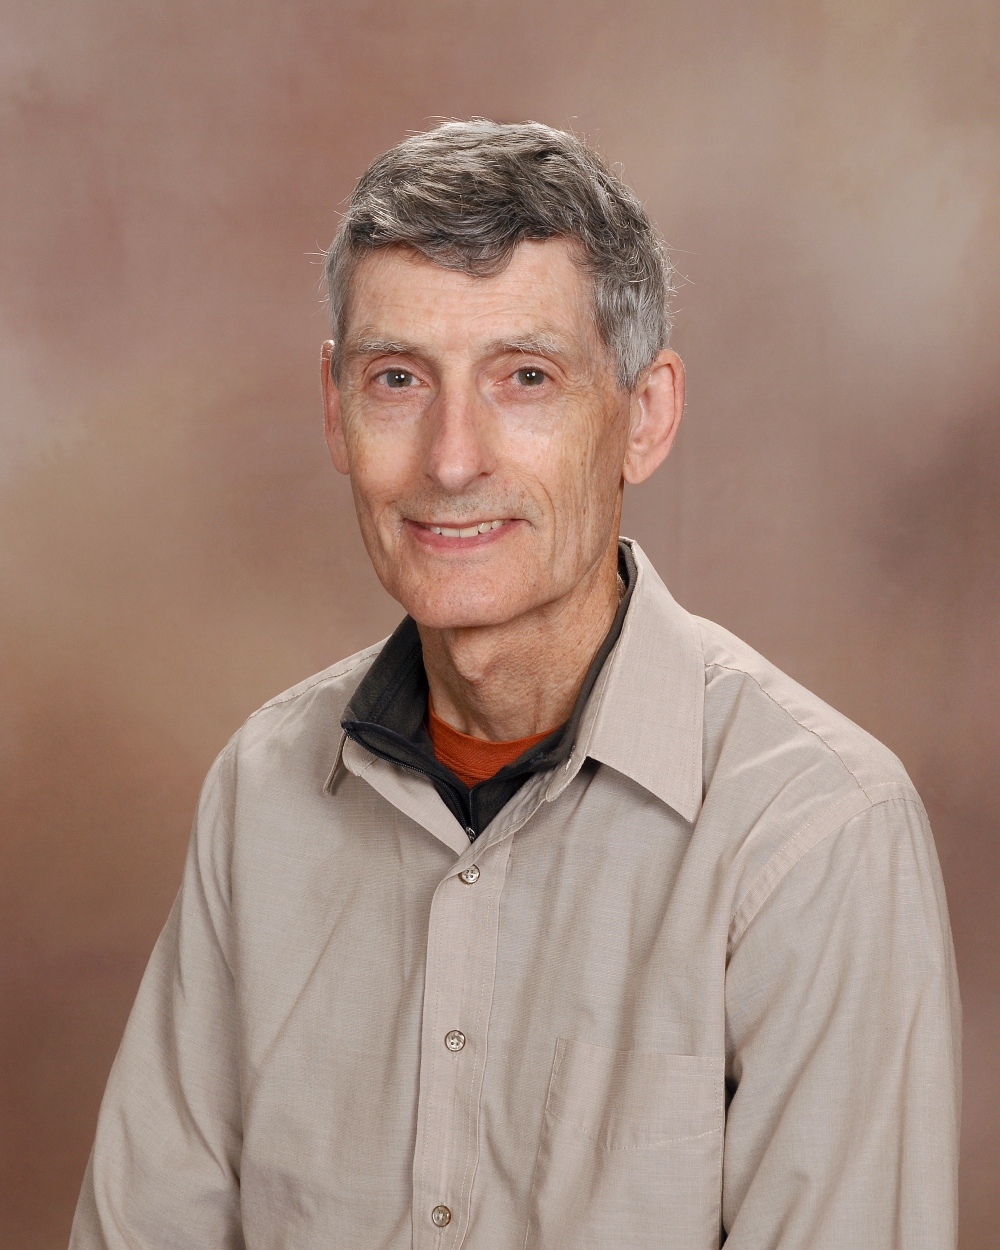 Bruce Galvin